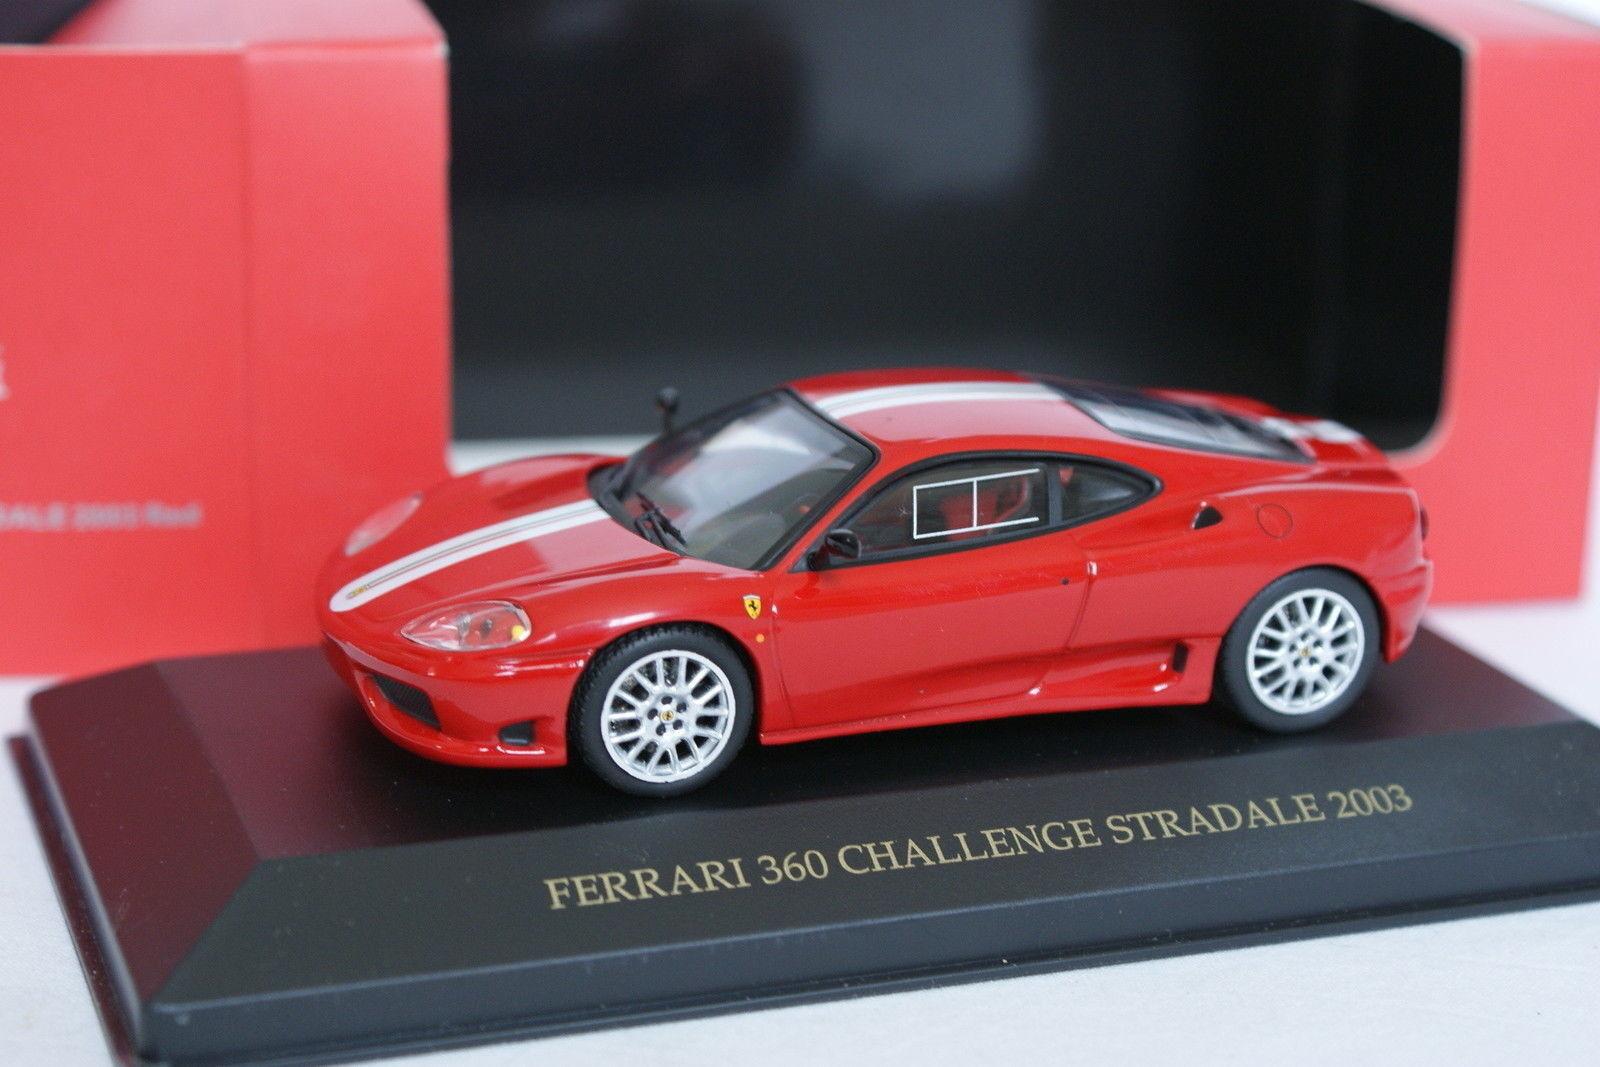 Ixo 1 43 - Ferrari 360 Herausforderung Stradale Stradale Stradale 2003 1047d7